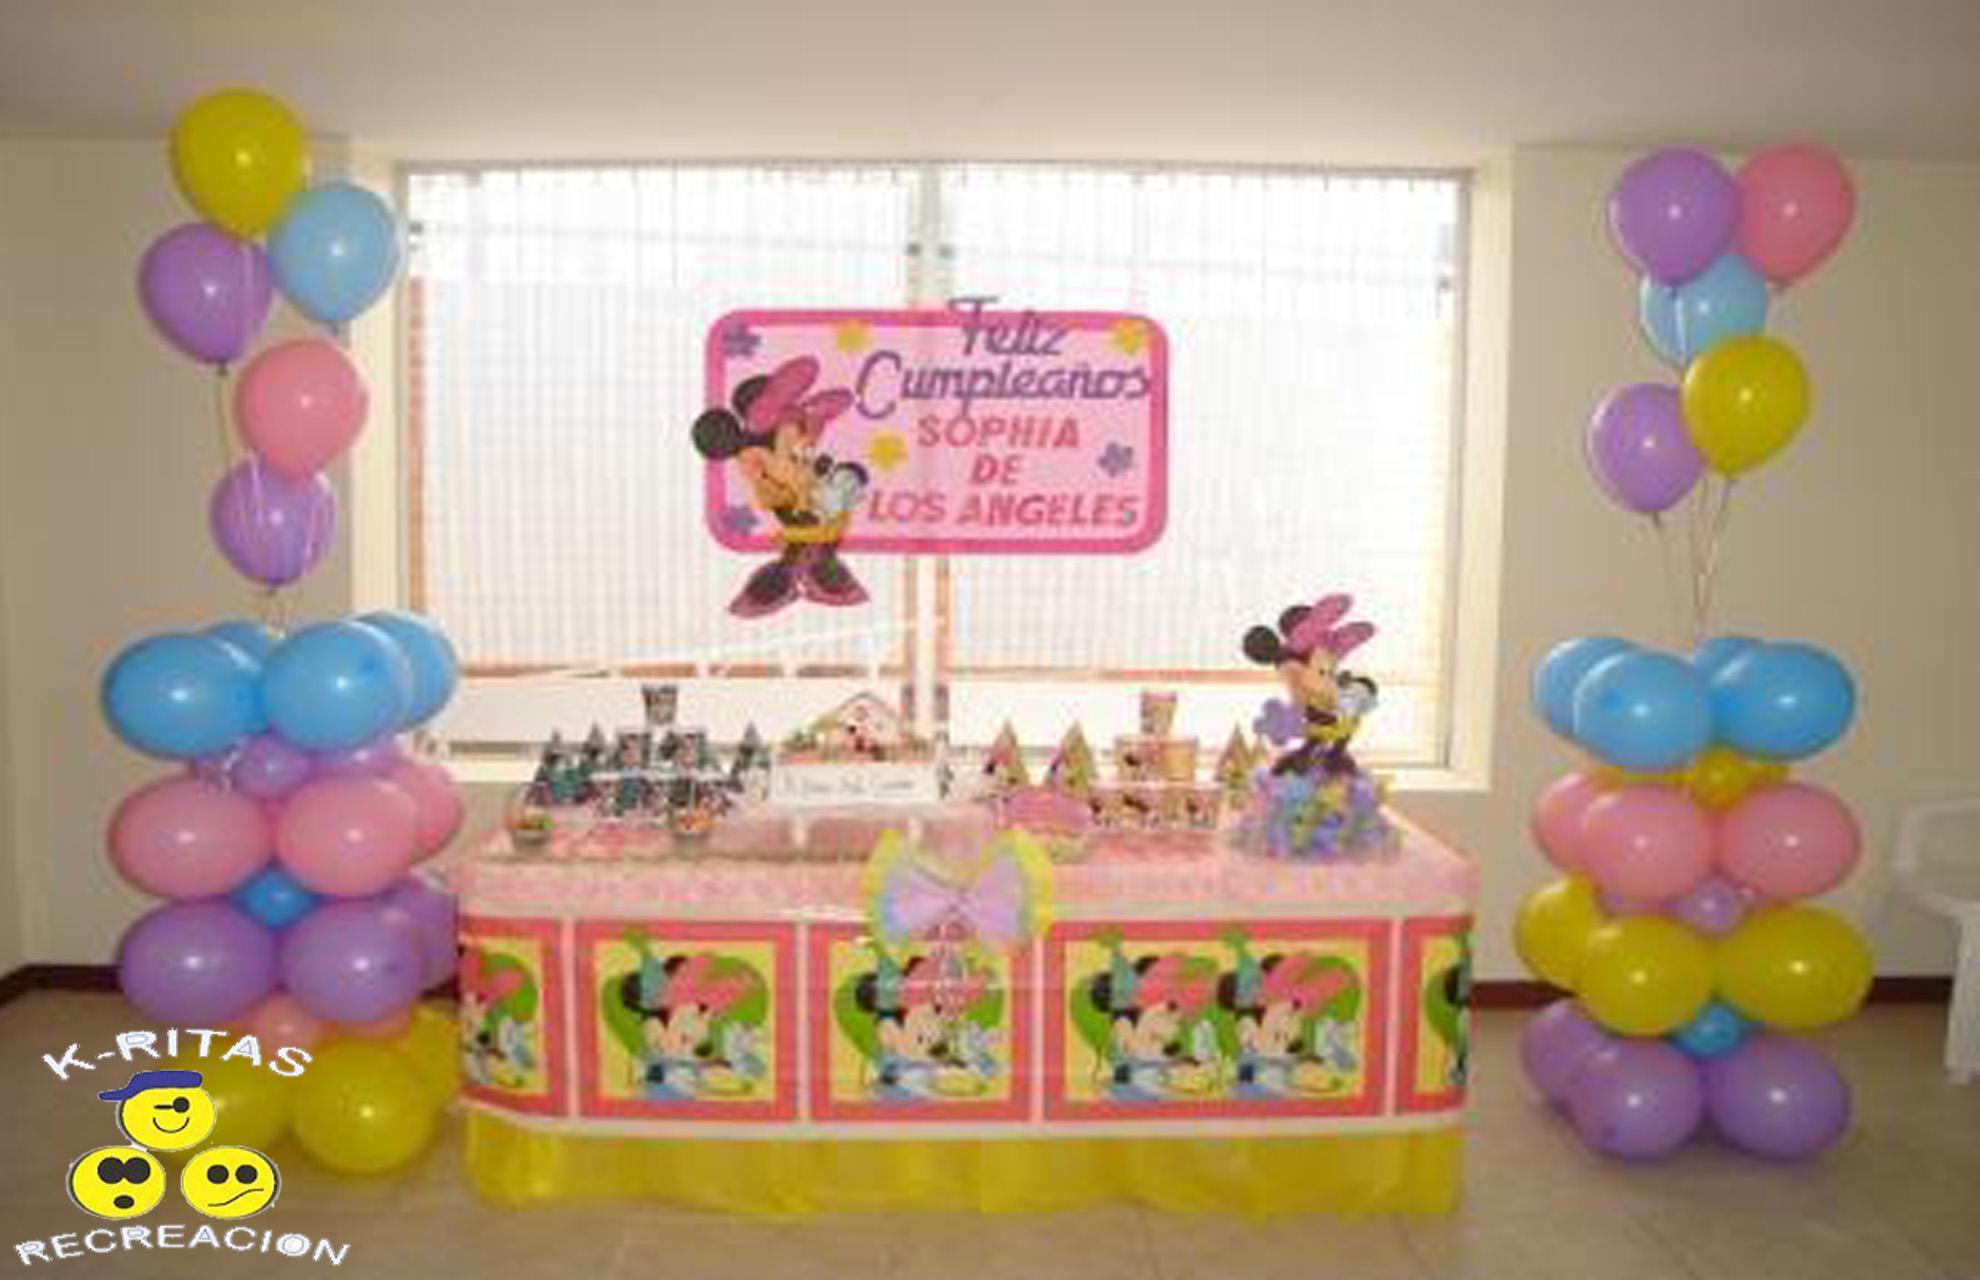 Decoracion fiestas infantiles bogota pbx 4514936 pi atas for Decoracion de pinatas infantiles